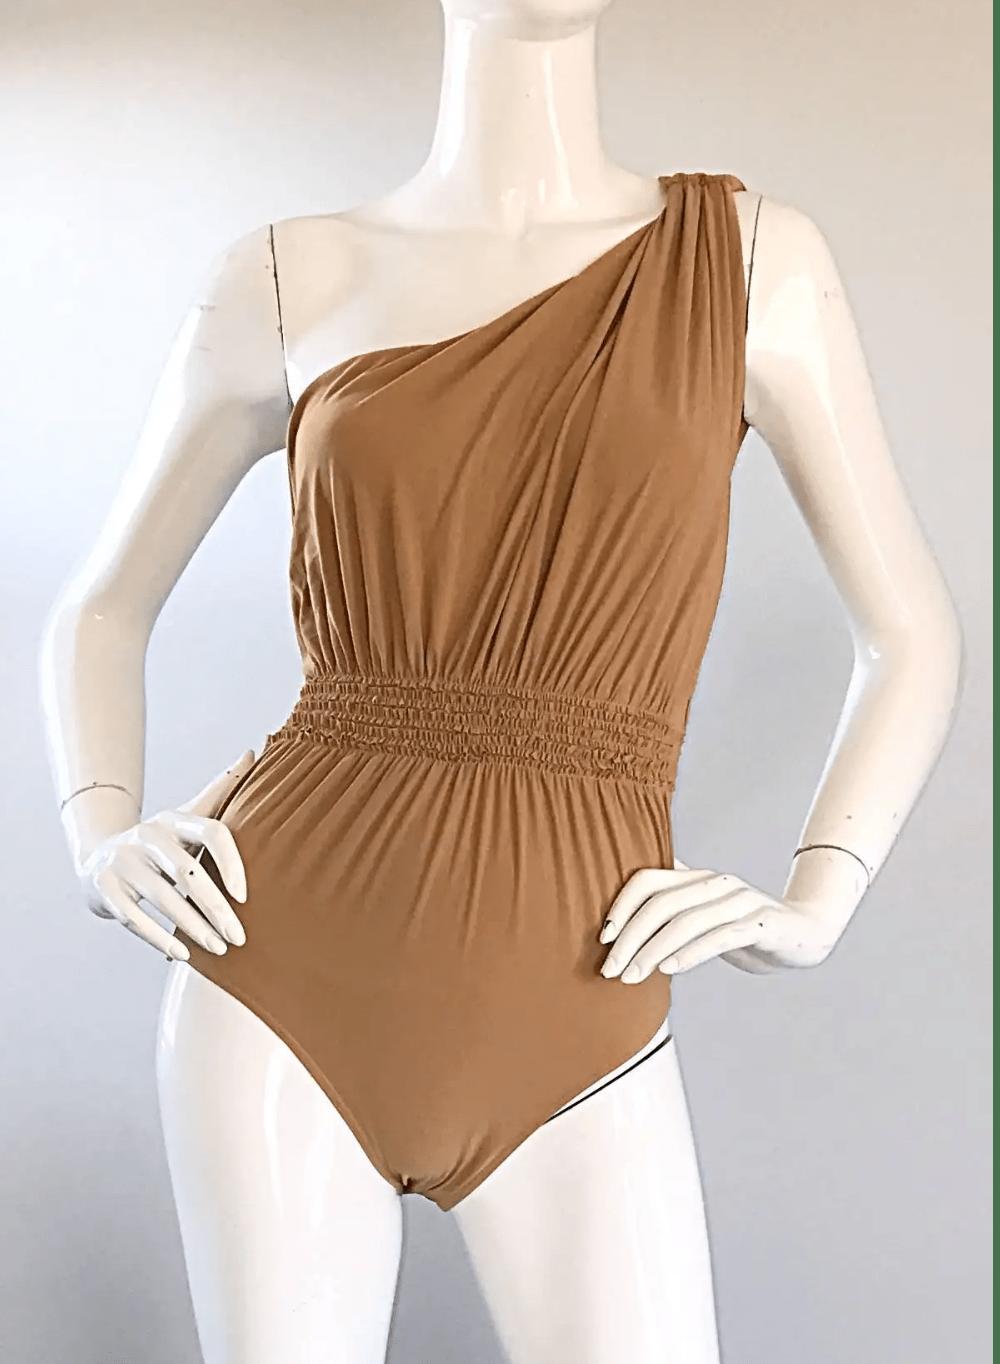 Lanvin 2011 Alber Elbaz Tan Caramel One Shoulder Grecian Bodysuit or Swimsuit